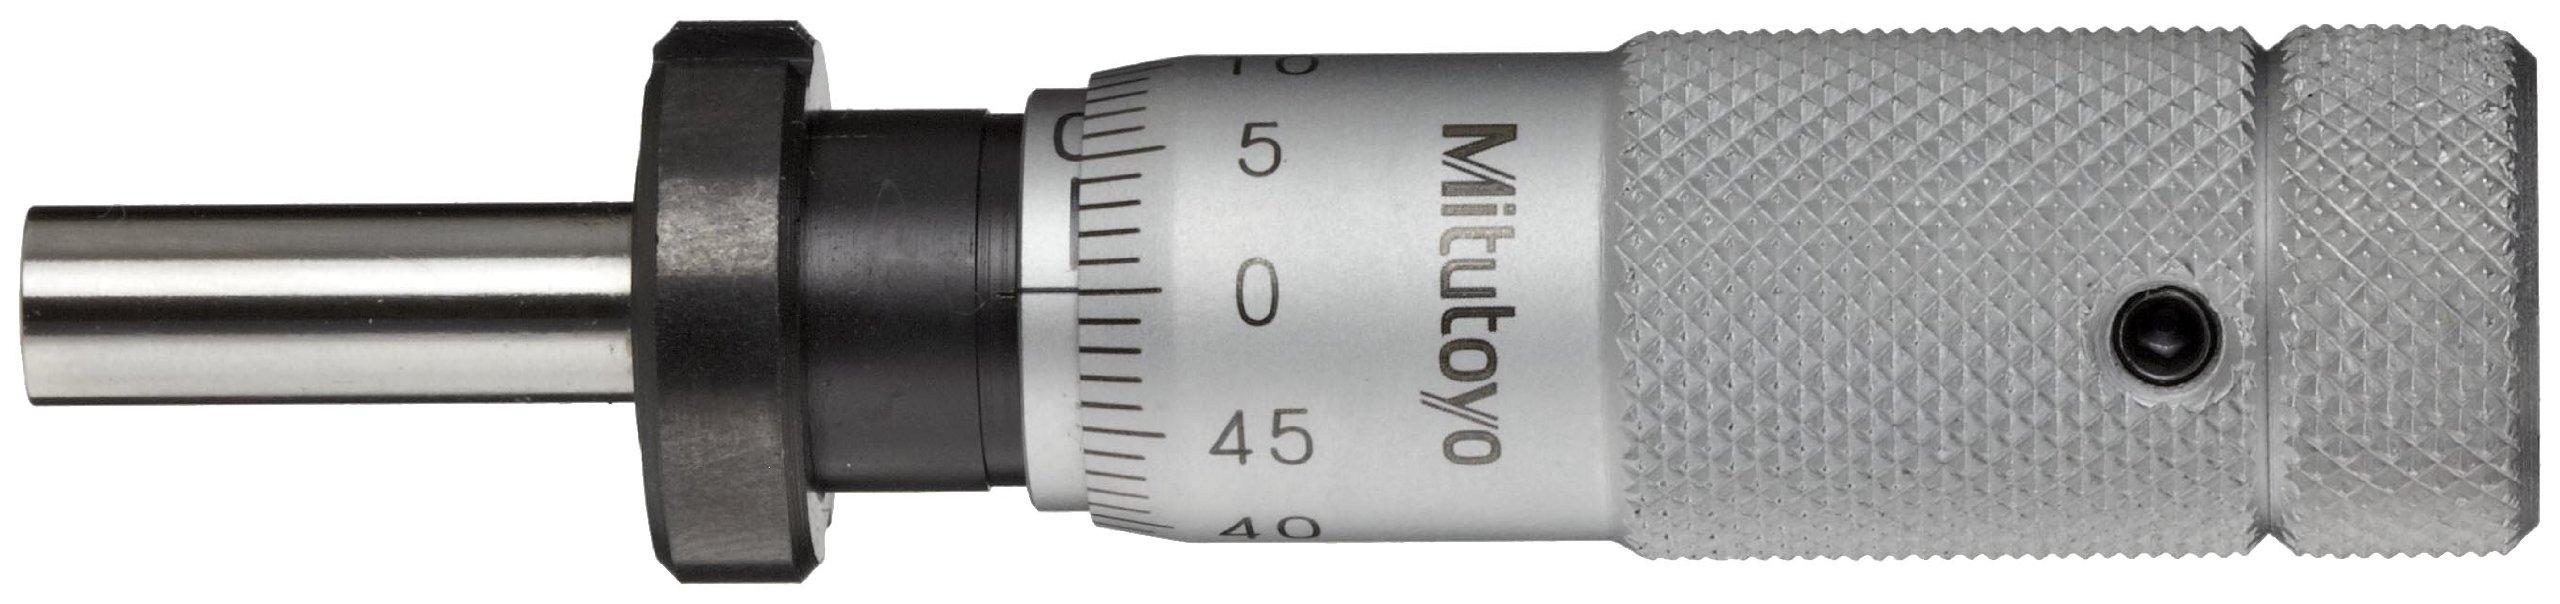 Mitutoyo 148-504 Micrometer Head, Zero-Adjustable Thimble, 0-13mm Range, 0.01mm Graduation, +/-0.002mm Accuracy, Plain Thimble, Clamp Nut, Flat Face, Spindle Lock